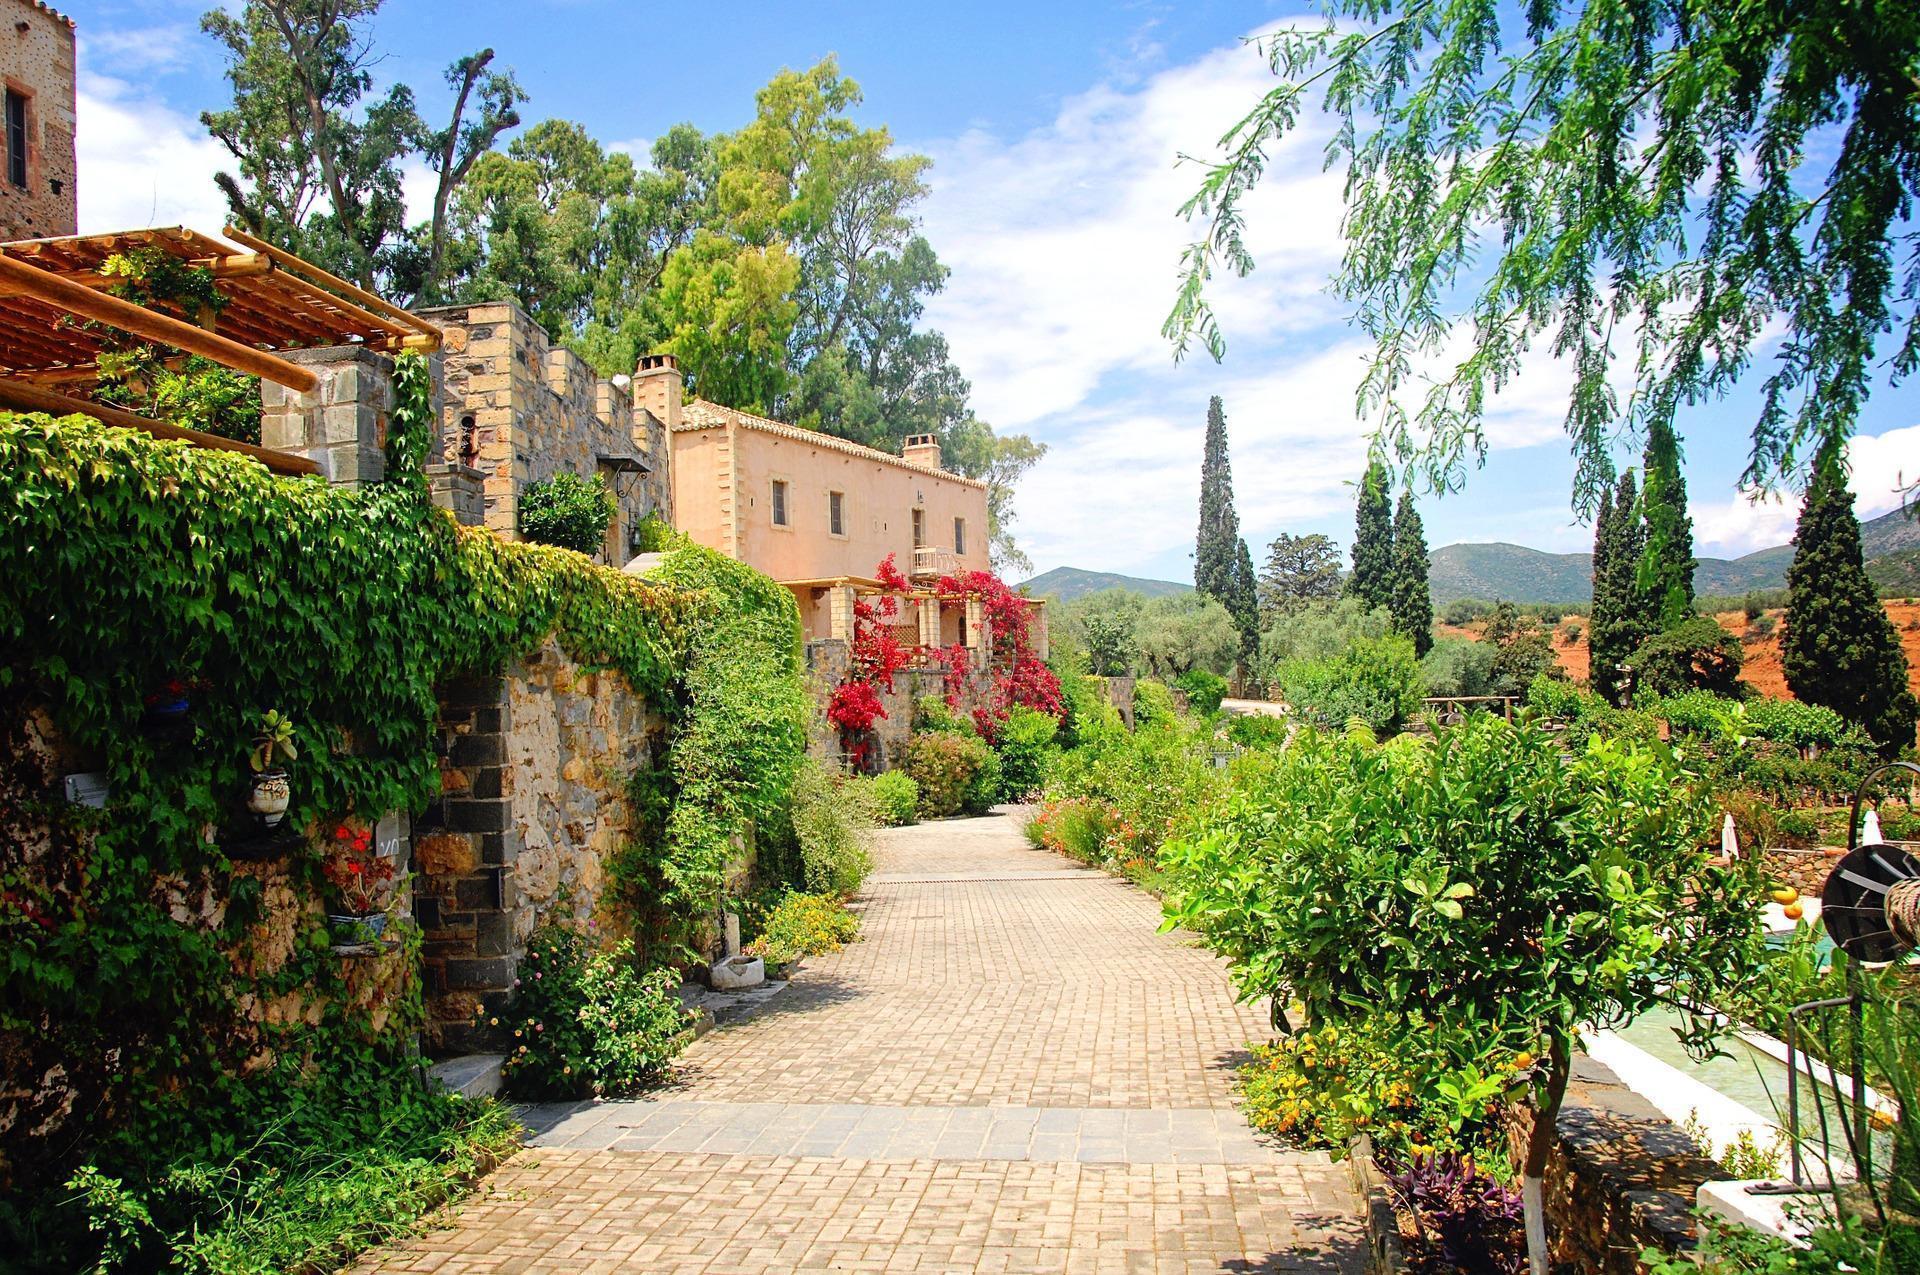 Luxury Hotel in Greece Countryside